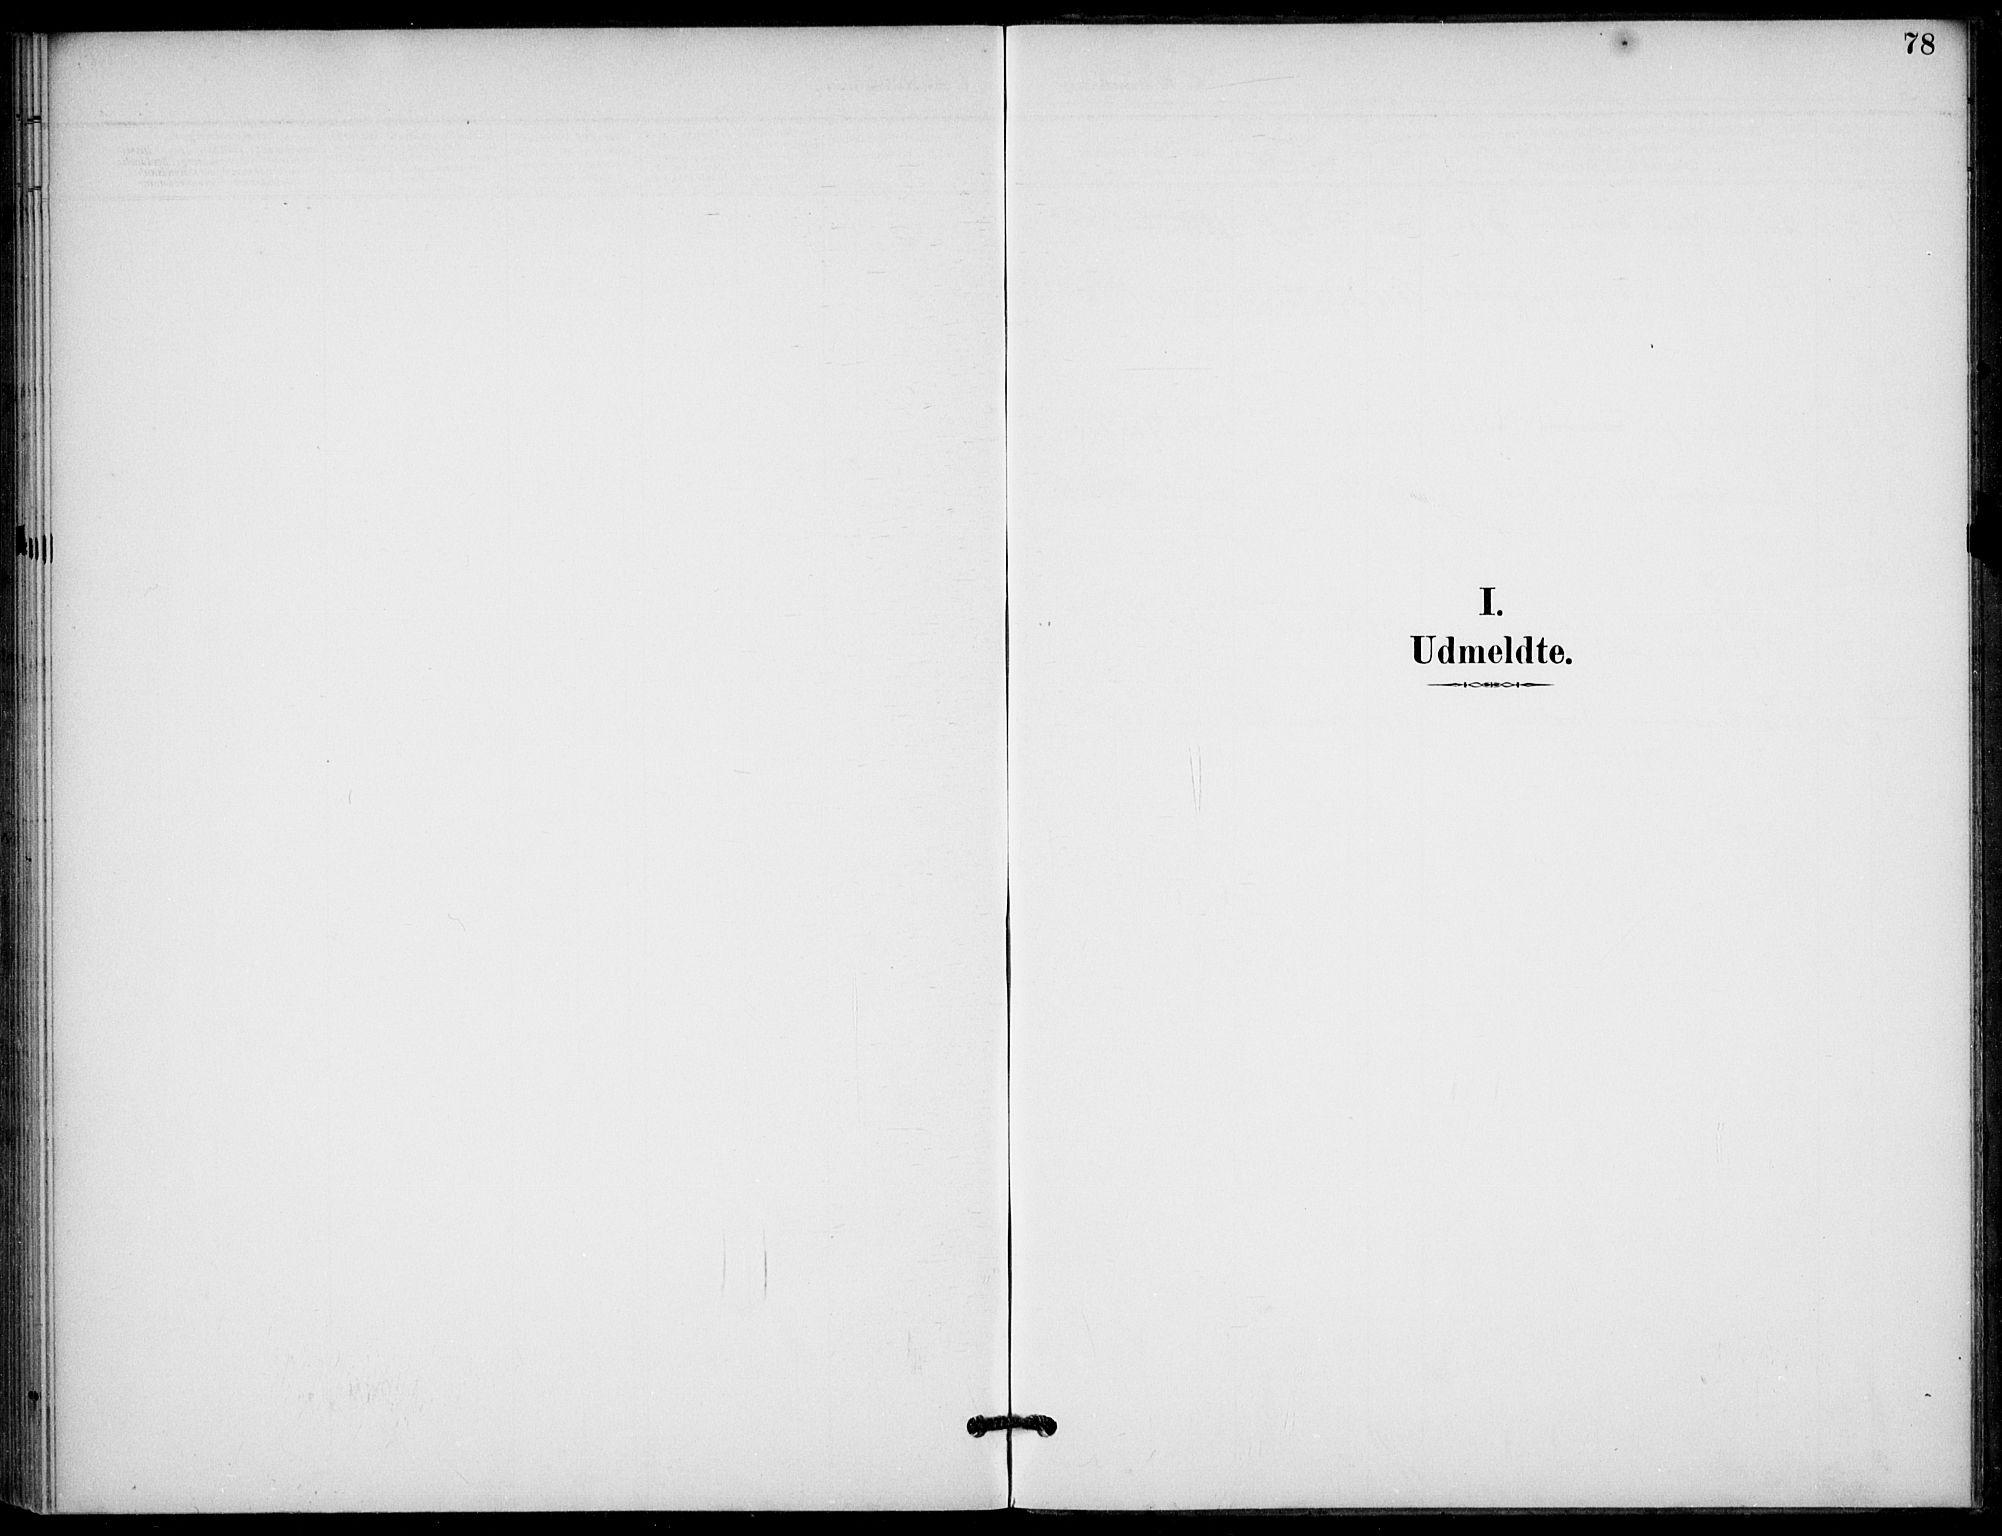 SAKO, Lunde kirkebøker, F/Fb/L0004: Ministerialbok nr. II 4, 1892-1907, s. 78